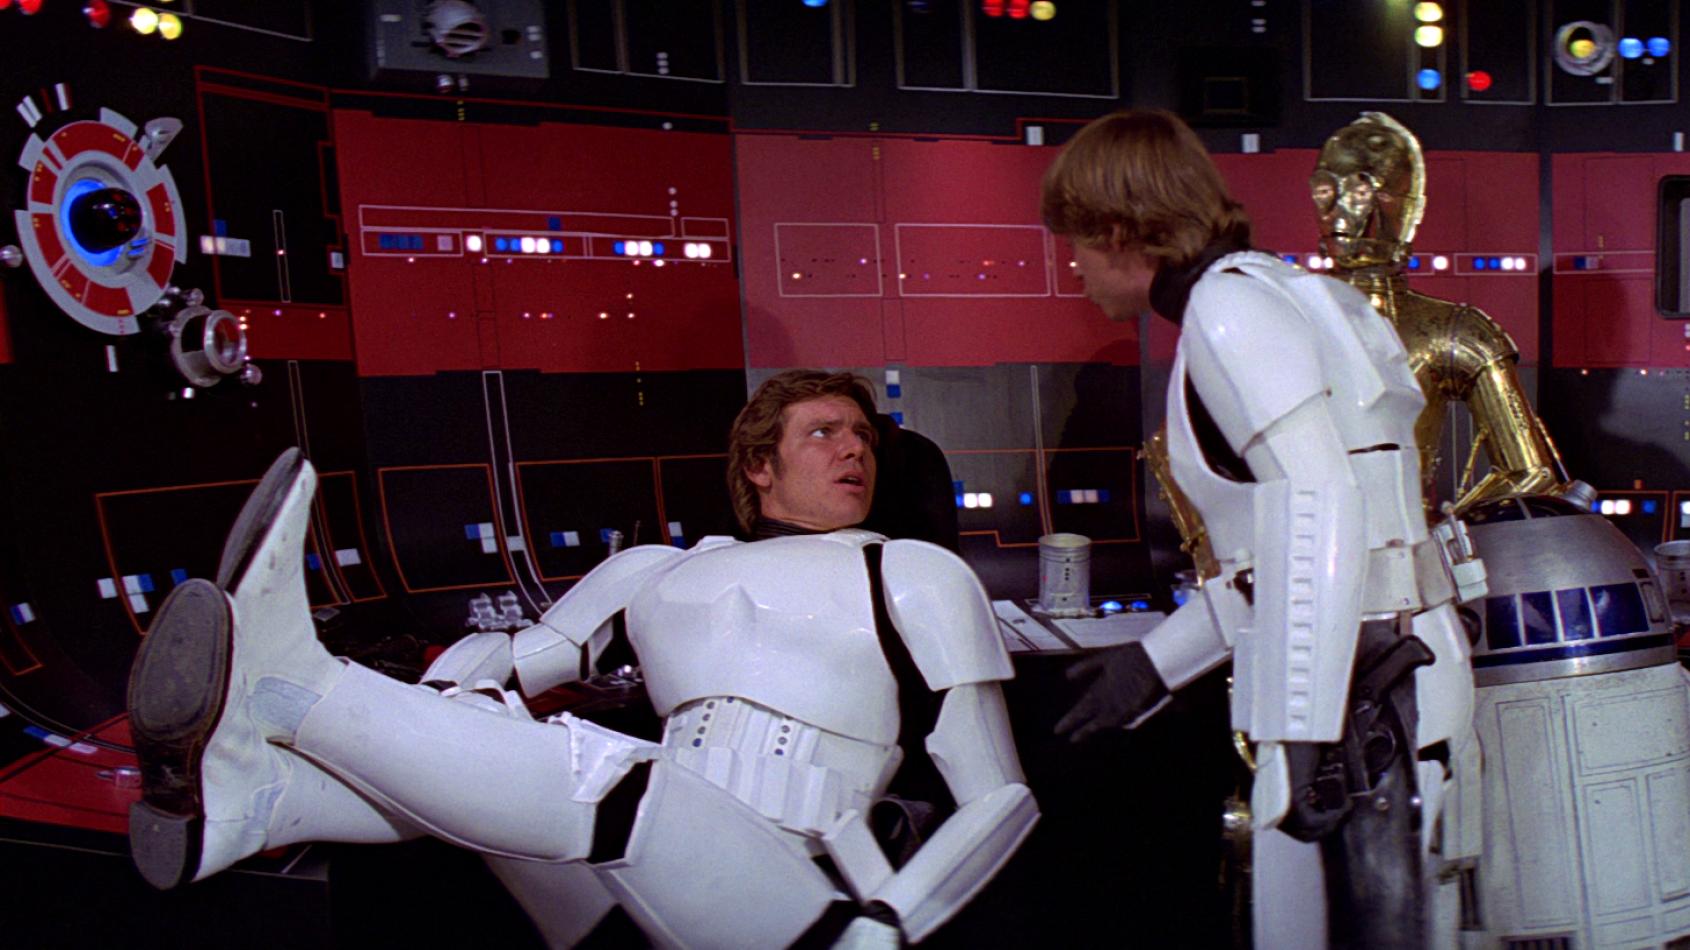 Han en Stormtrooper personnage du mois dans Galaxy of Heroes